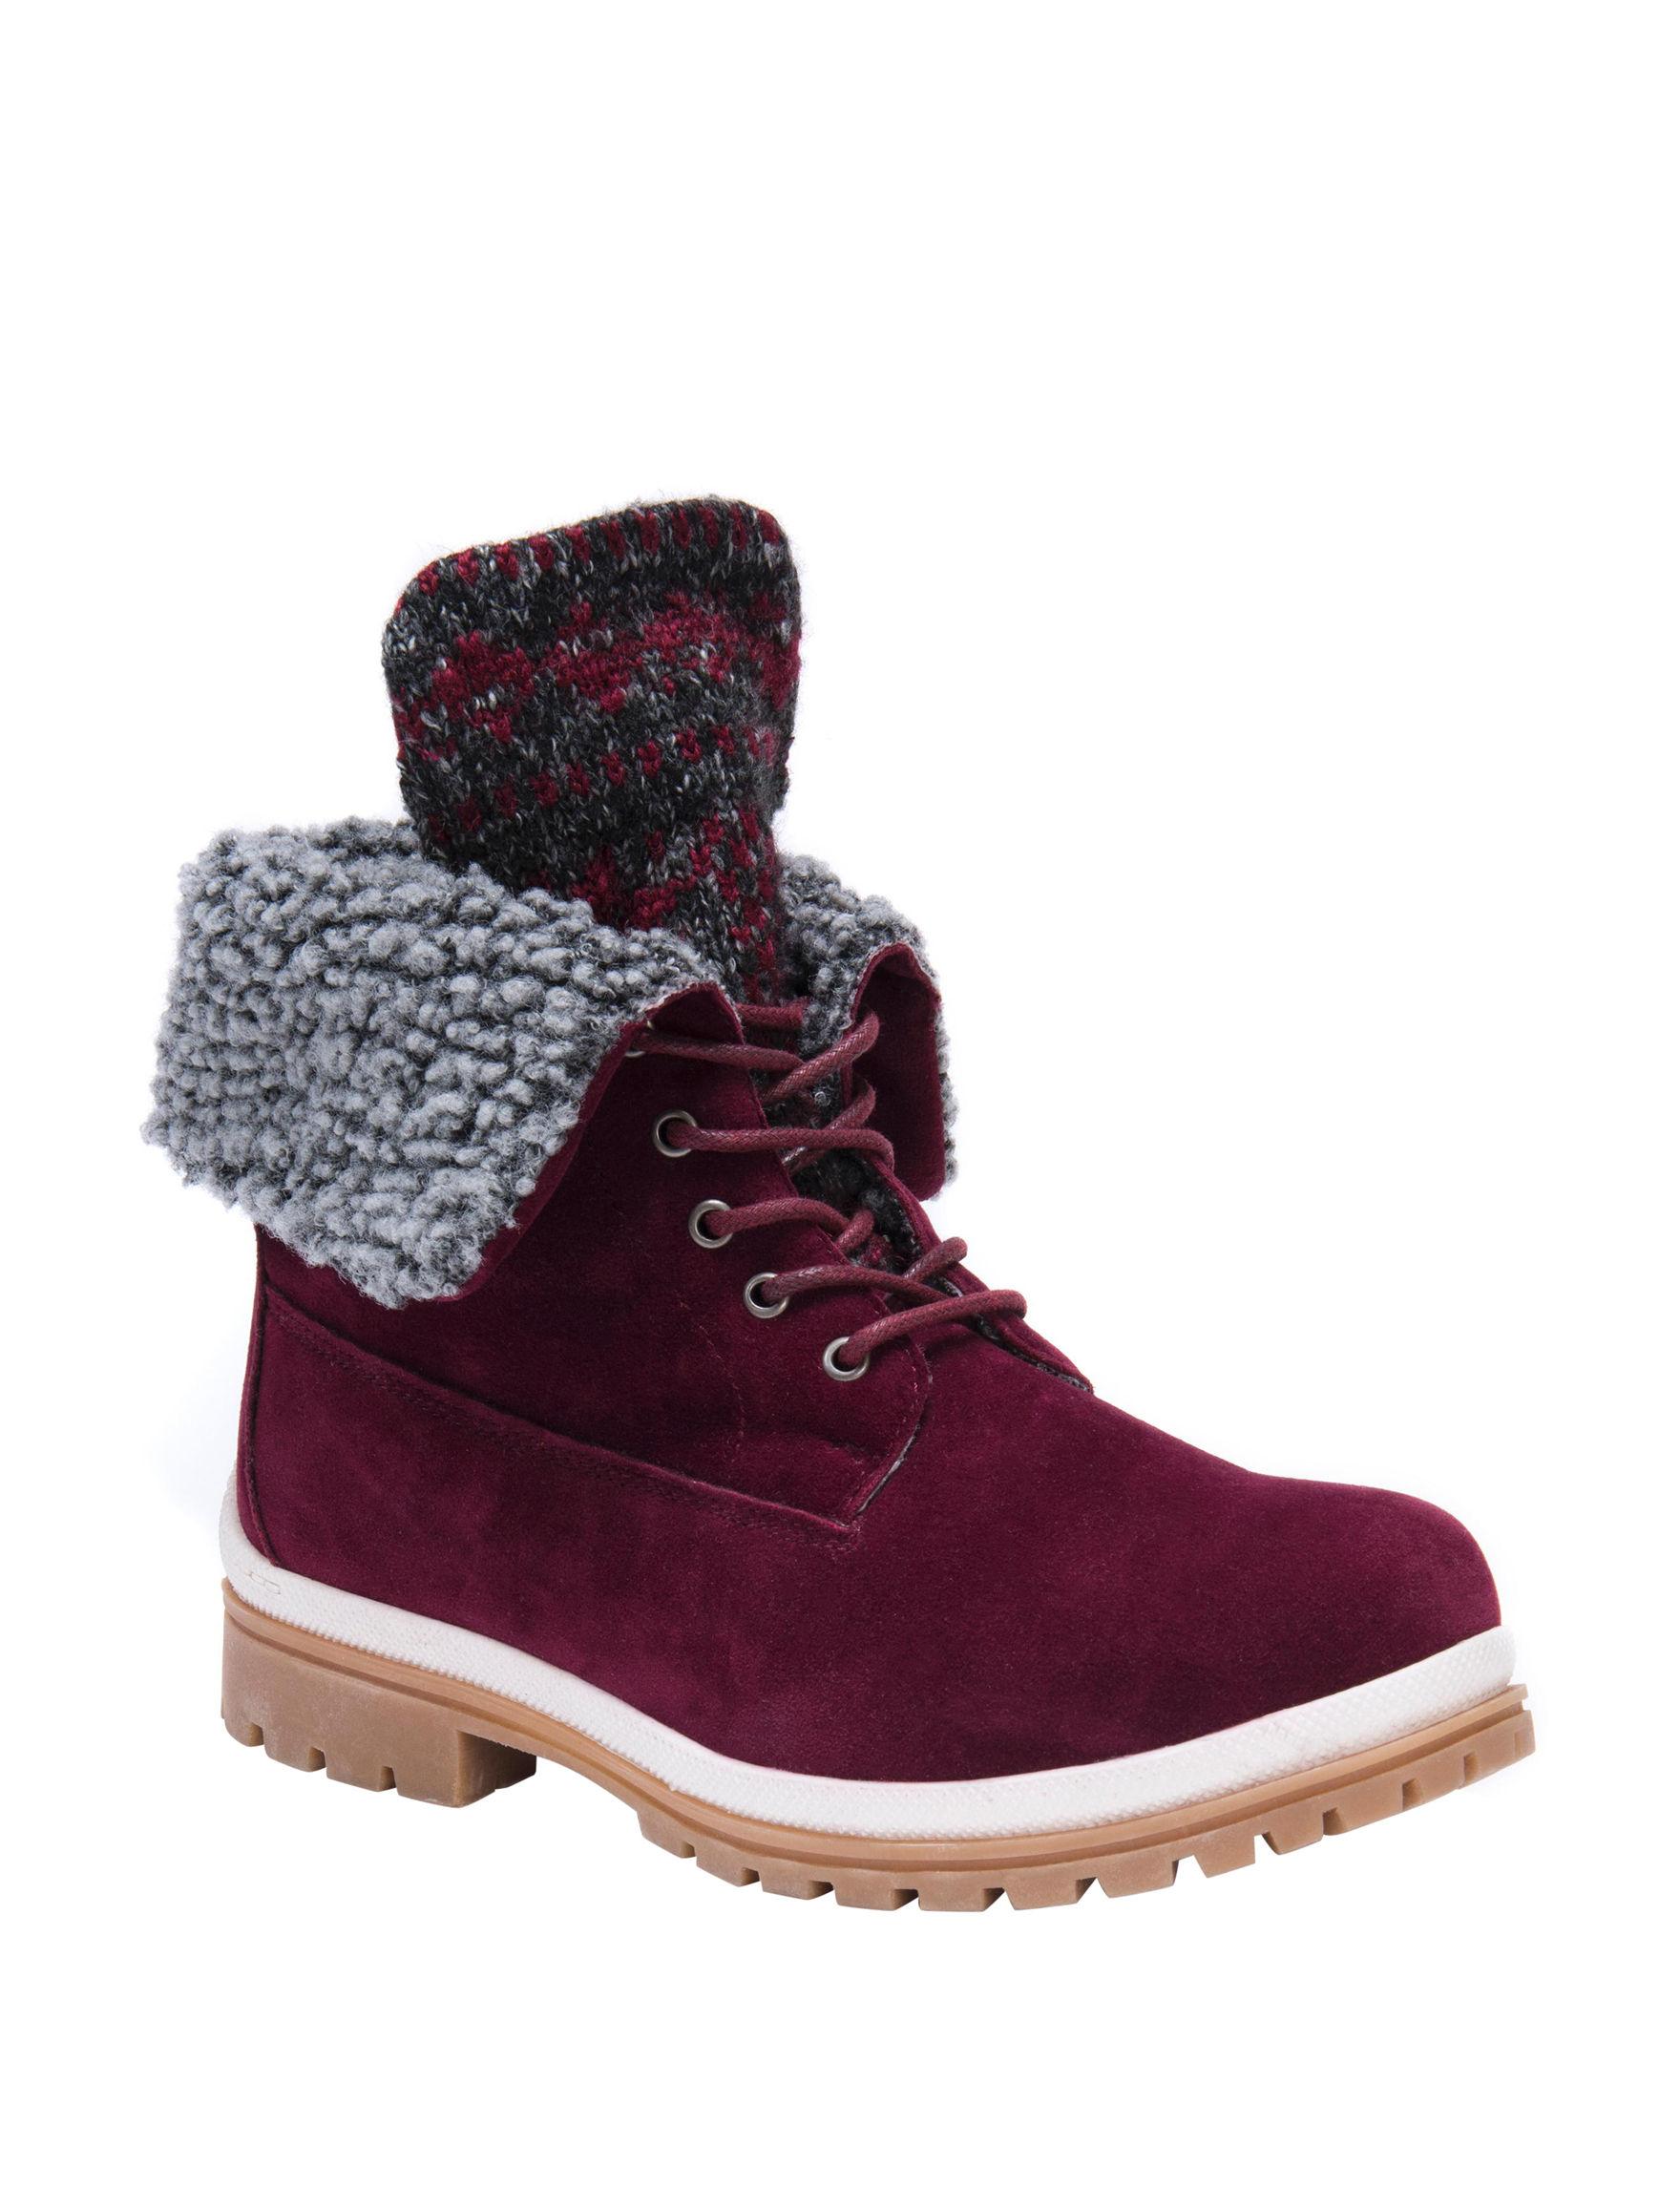 Muk Luks Burgundy Winter Boots